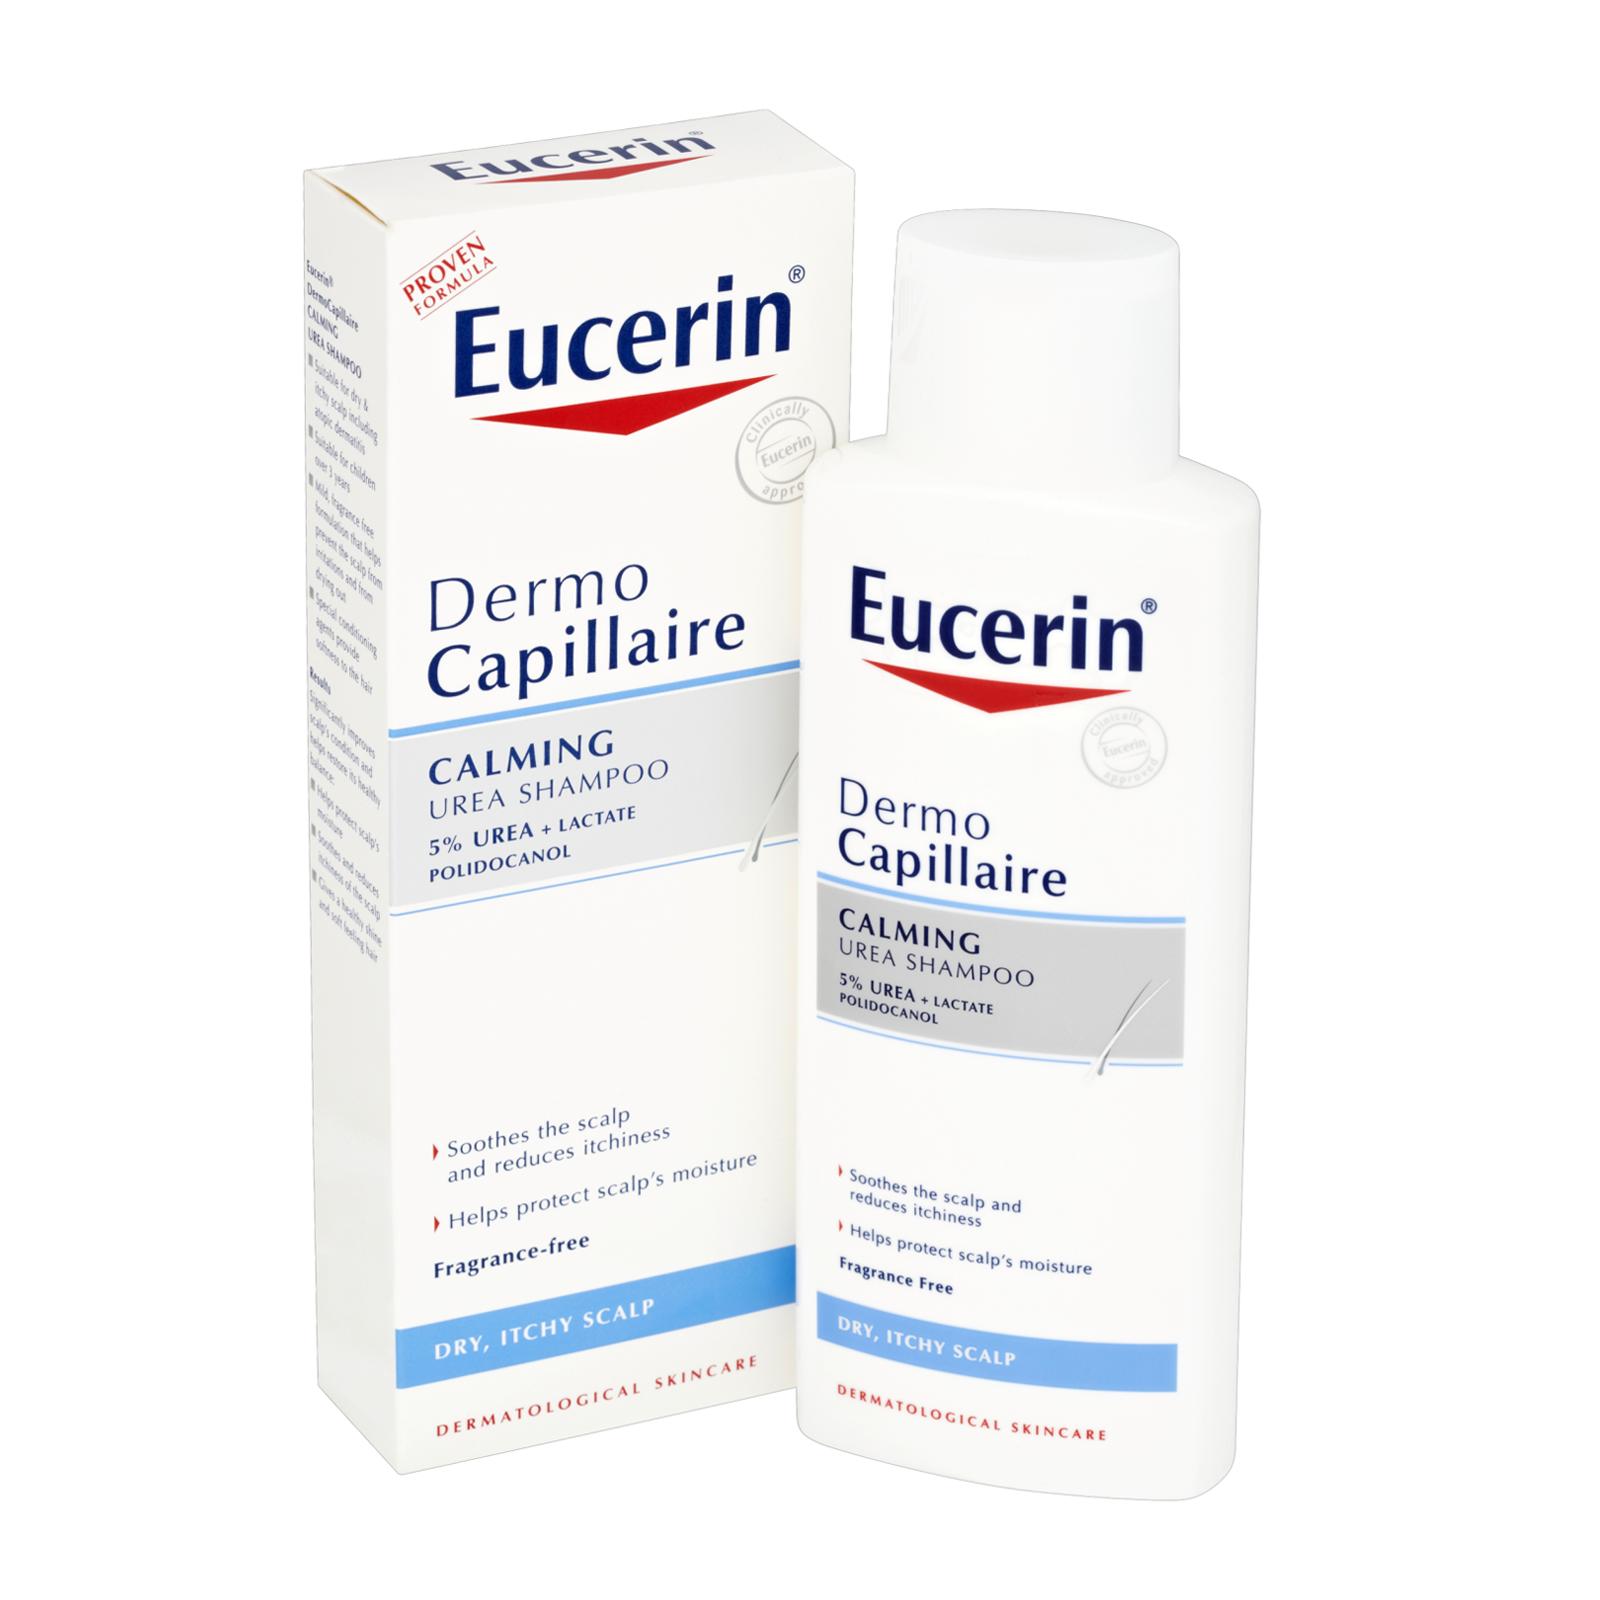 Eucerin Dermocapillaire Calming Urea Shampoo 250ml In 2021 Shampoo For Dry Scalp Shampoo For Itchy Scalp Dry Scalp Shampoo Best